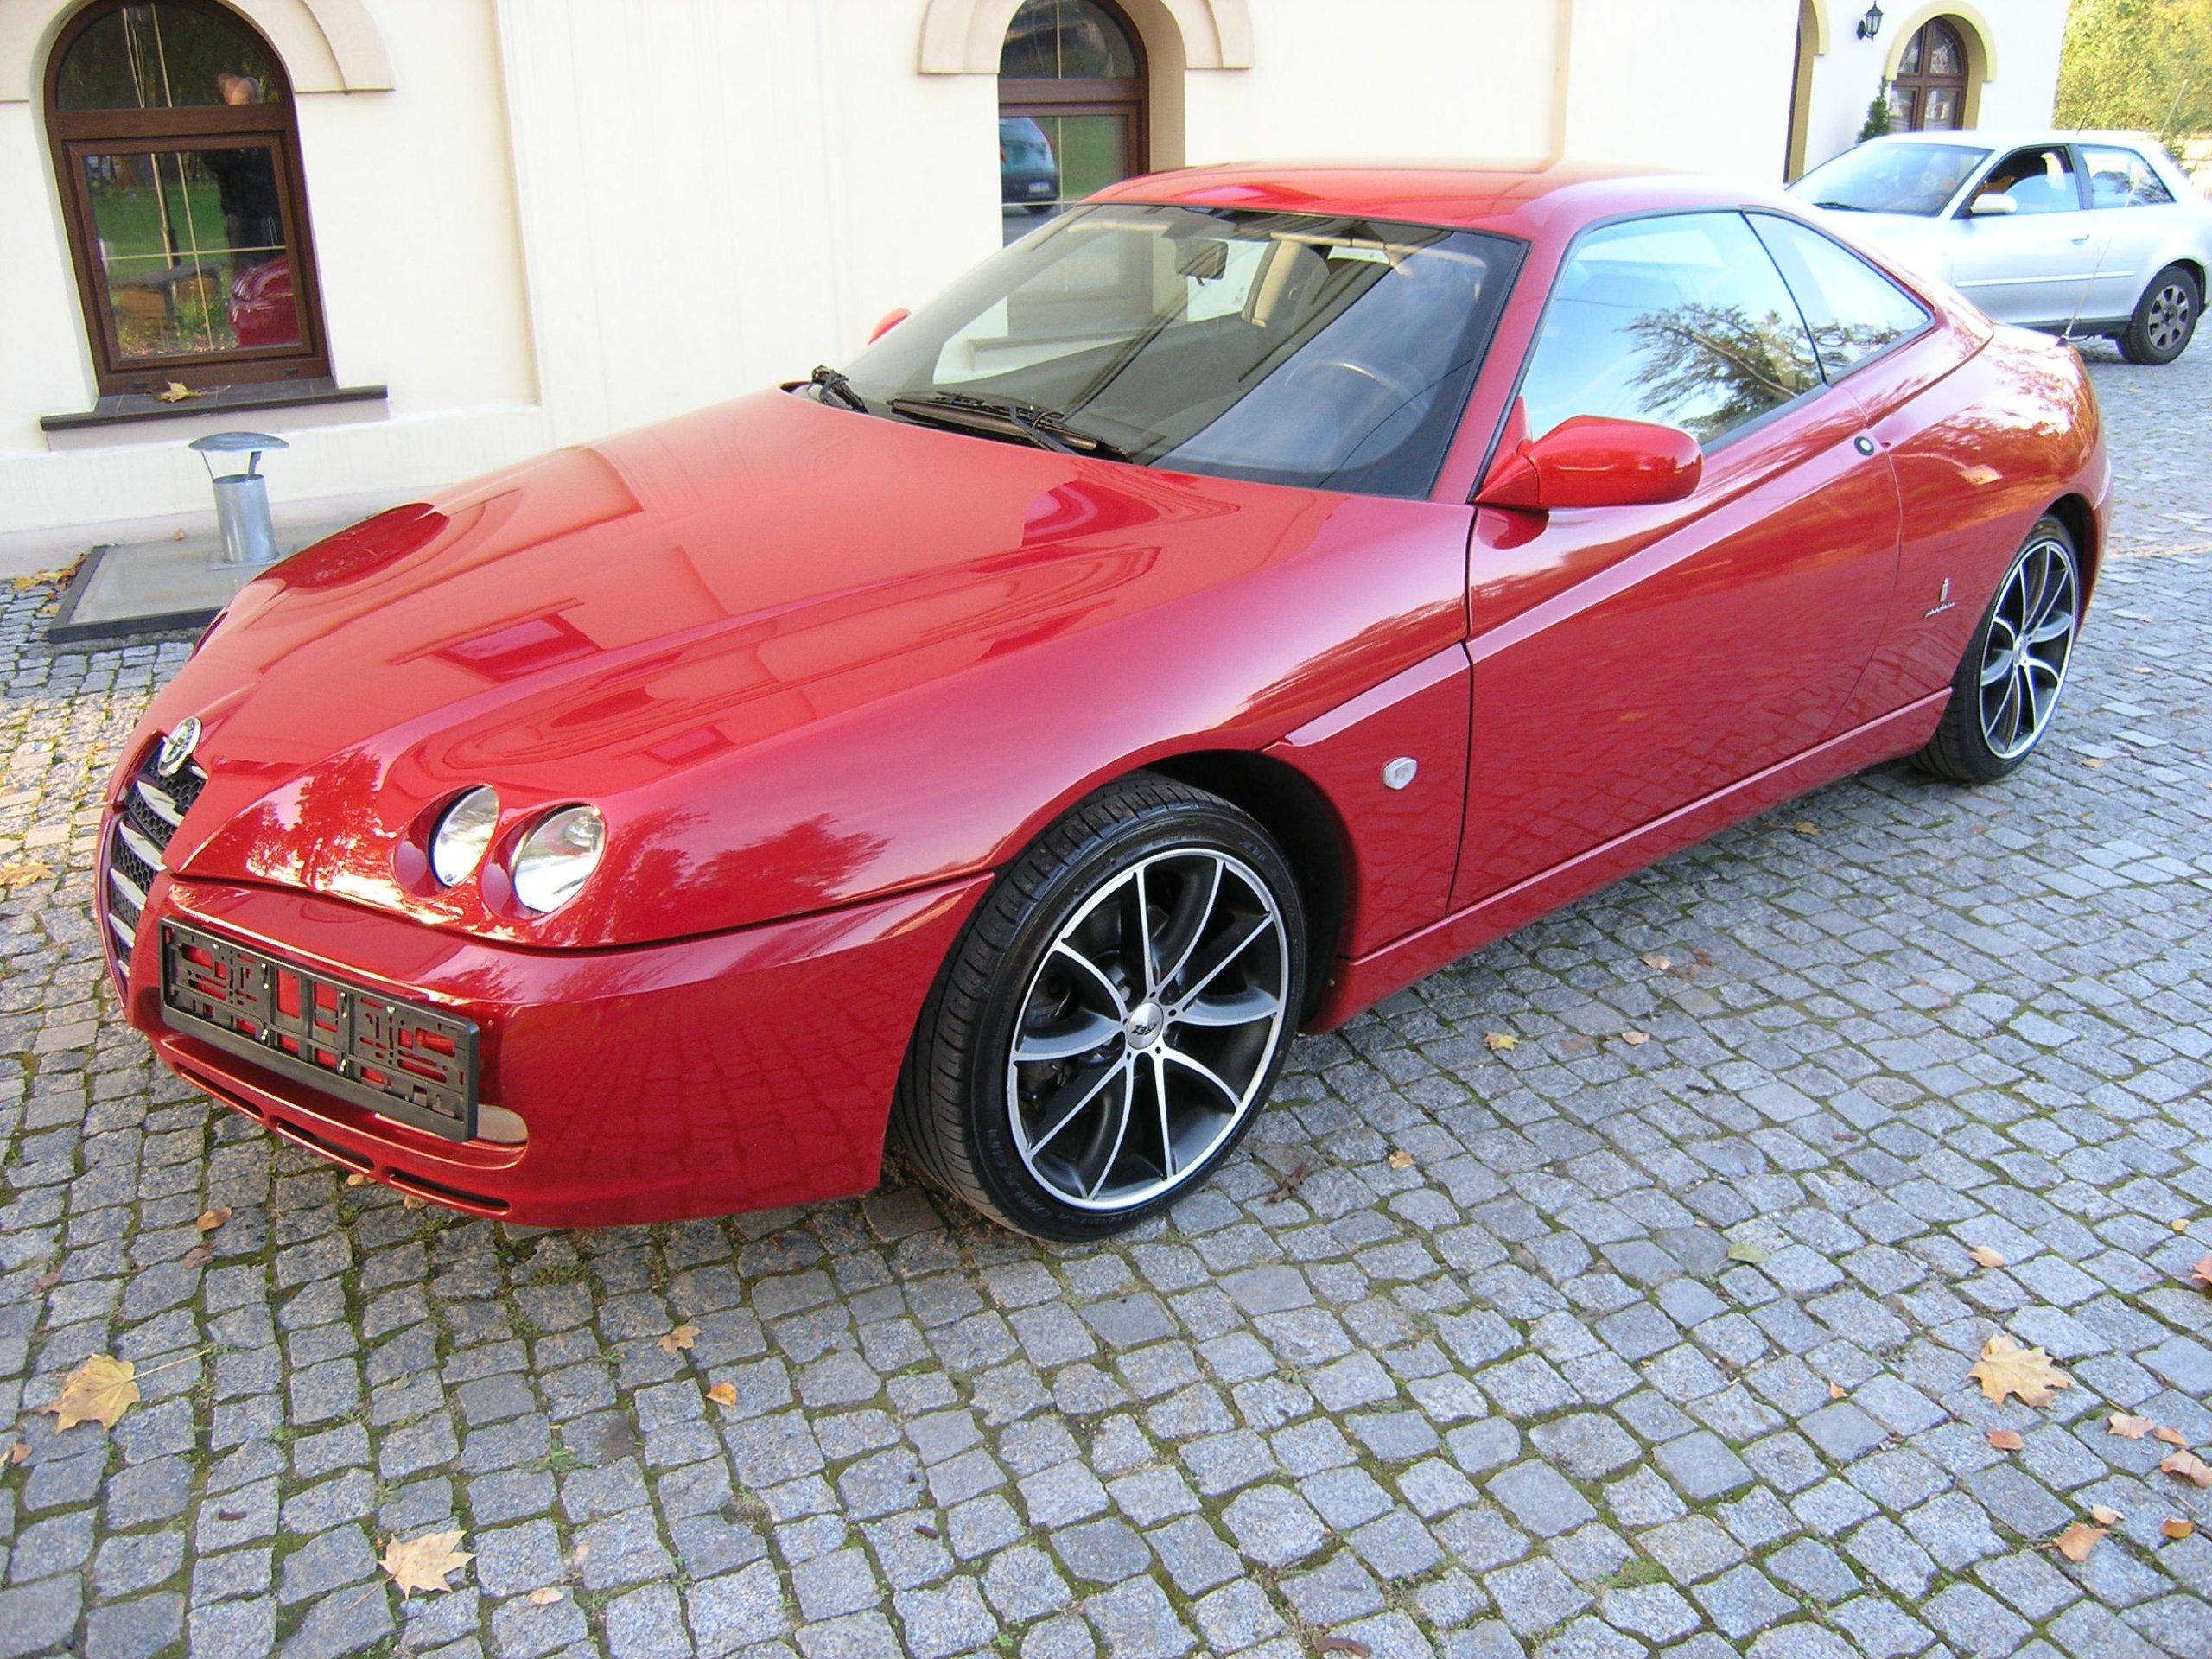 Alfa Romeo Gtv 2 0 Piekna 2005r Sprowadzona 6984090804 Oficjalne Archiwum Allegro